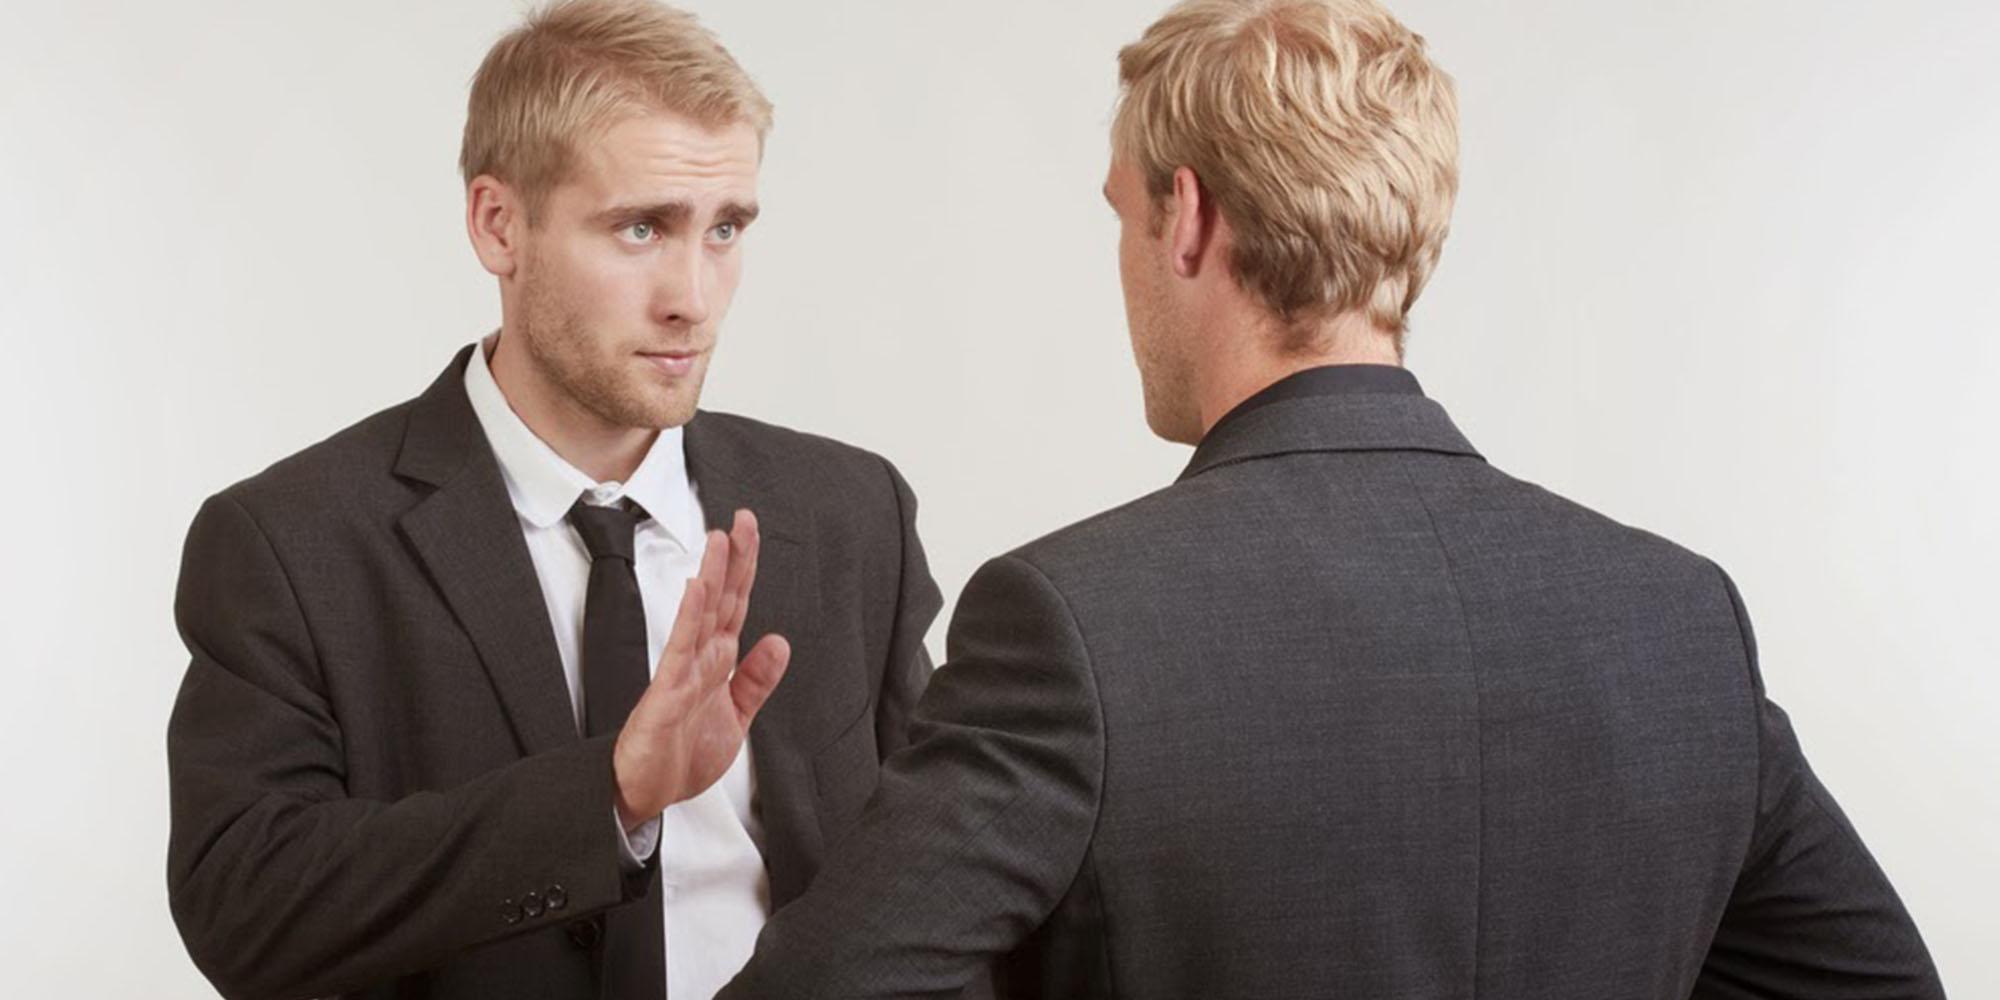 <b>Assertiveness issues</b>